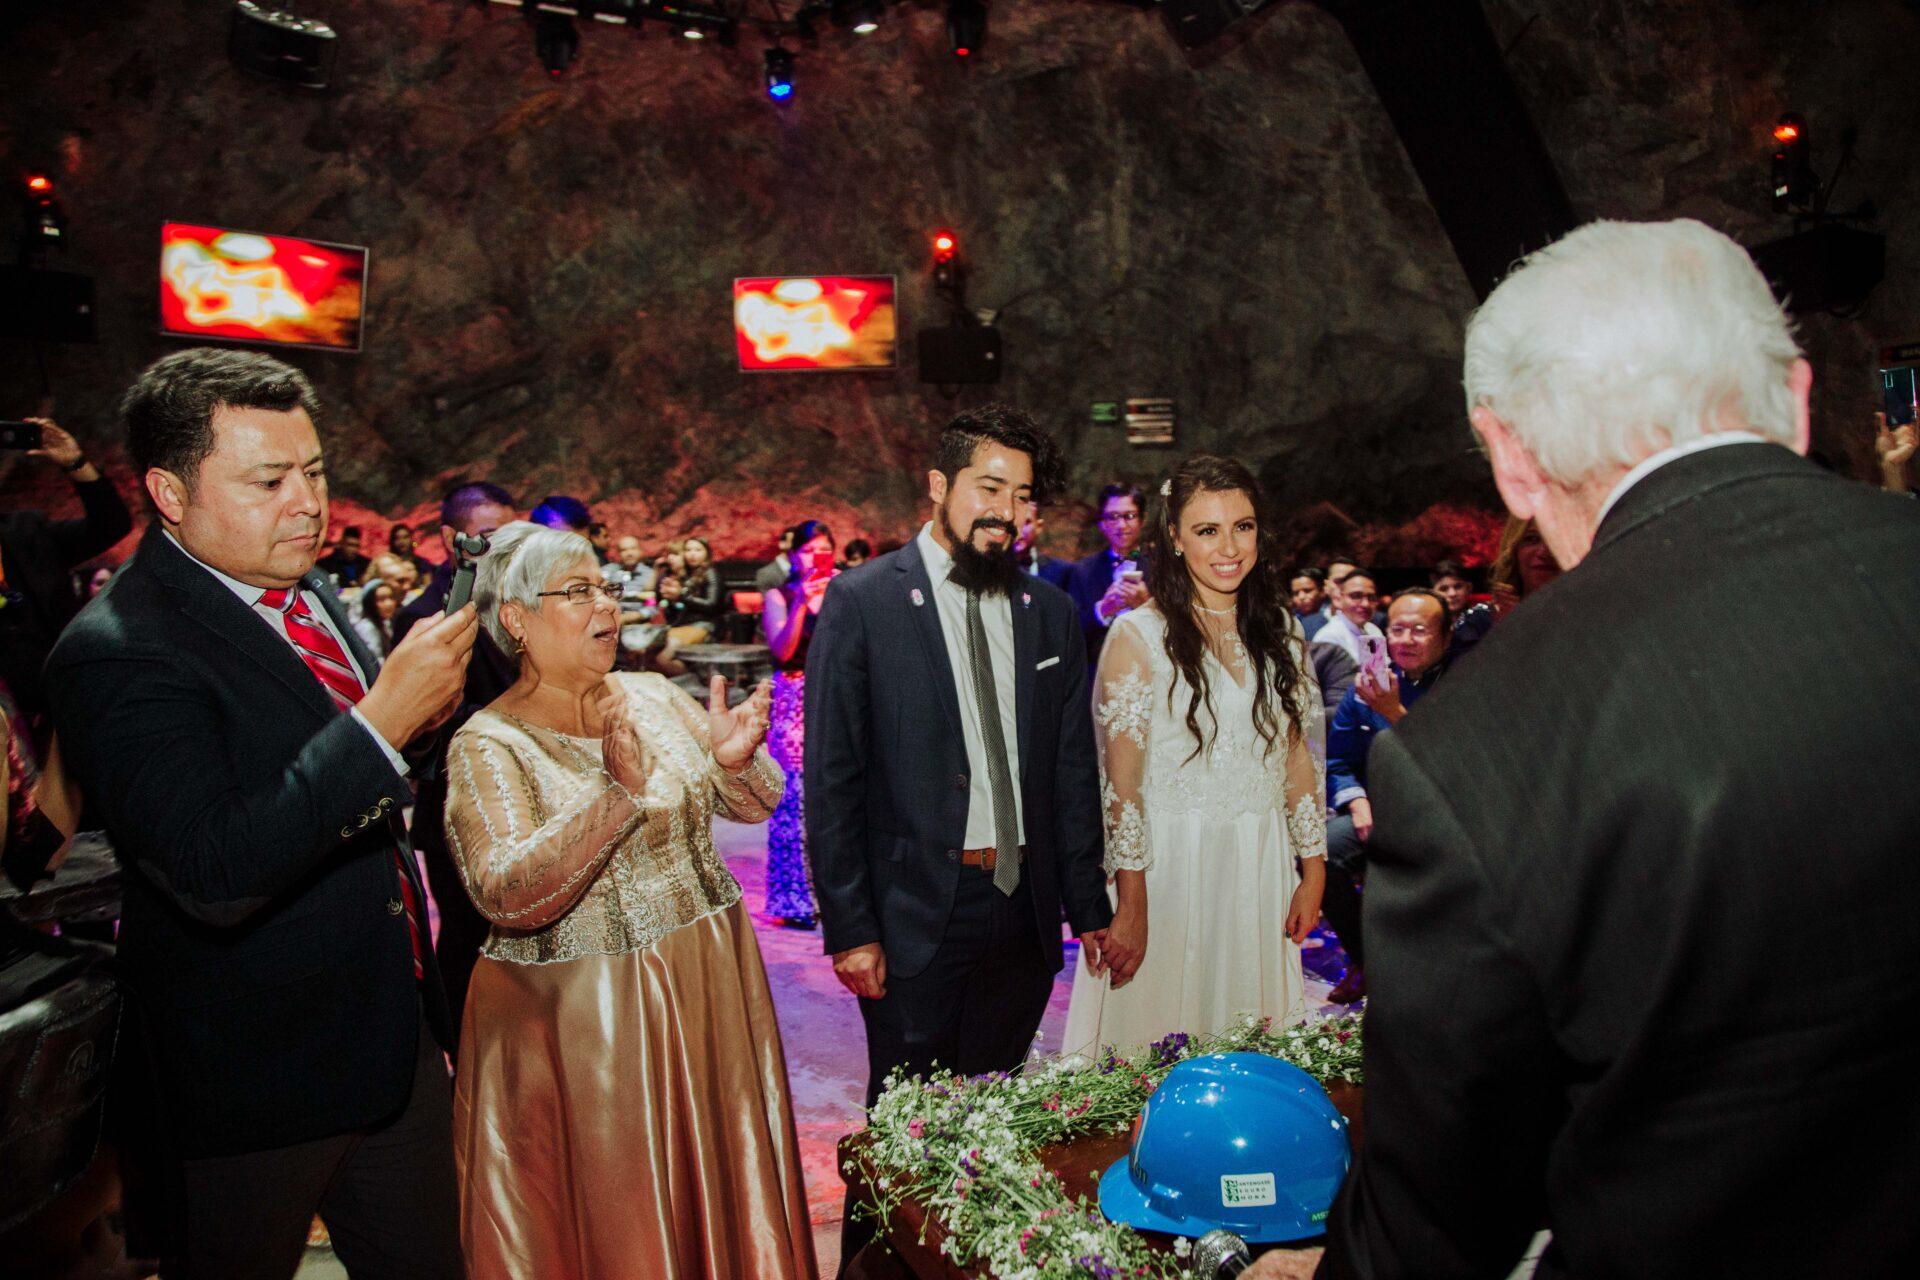 javier_noriega_fotografo_bodas_la_mina_club_zacatecas_wedding_photographer12